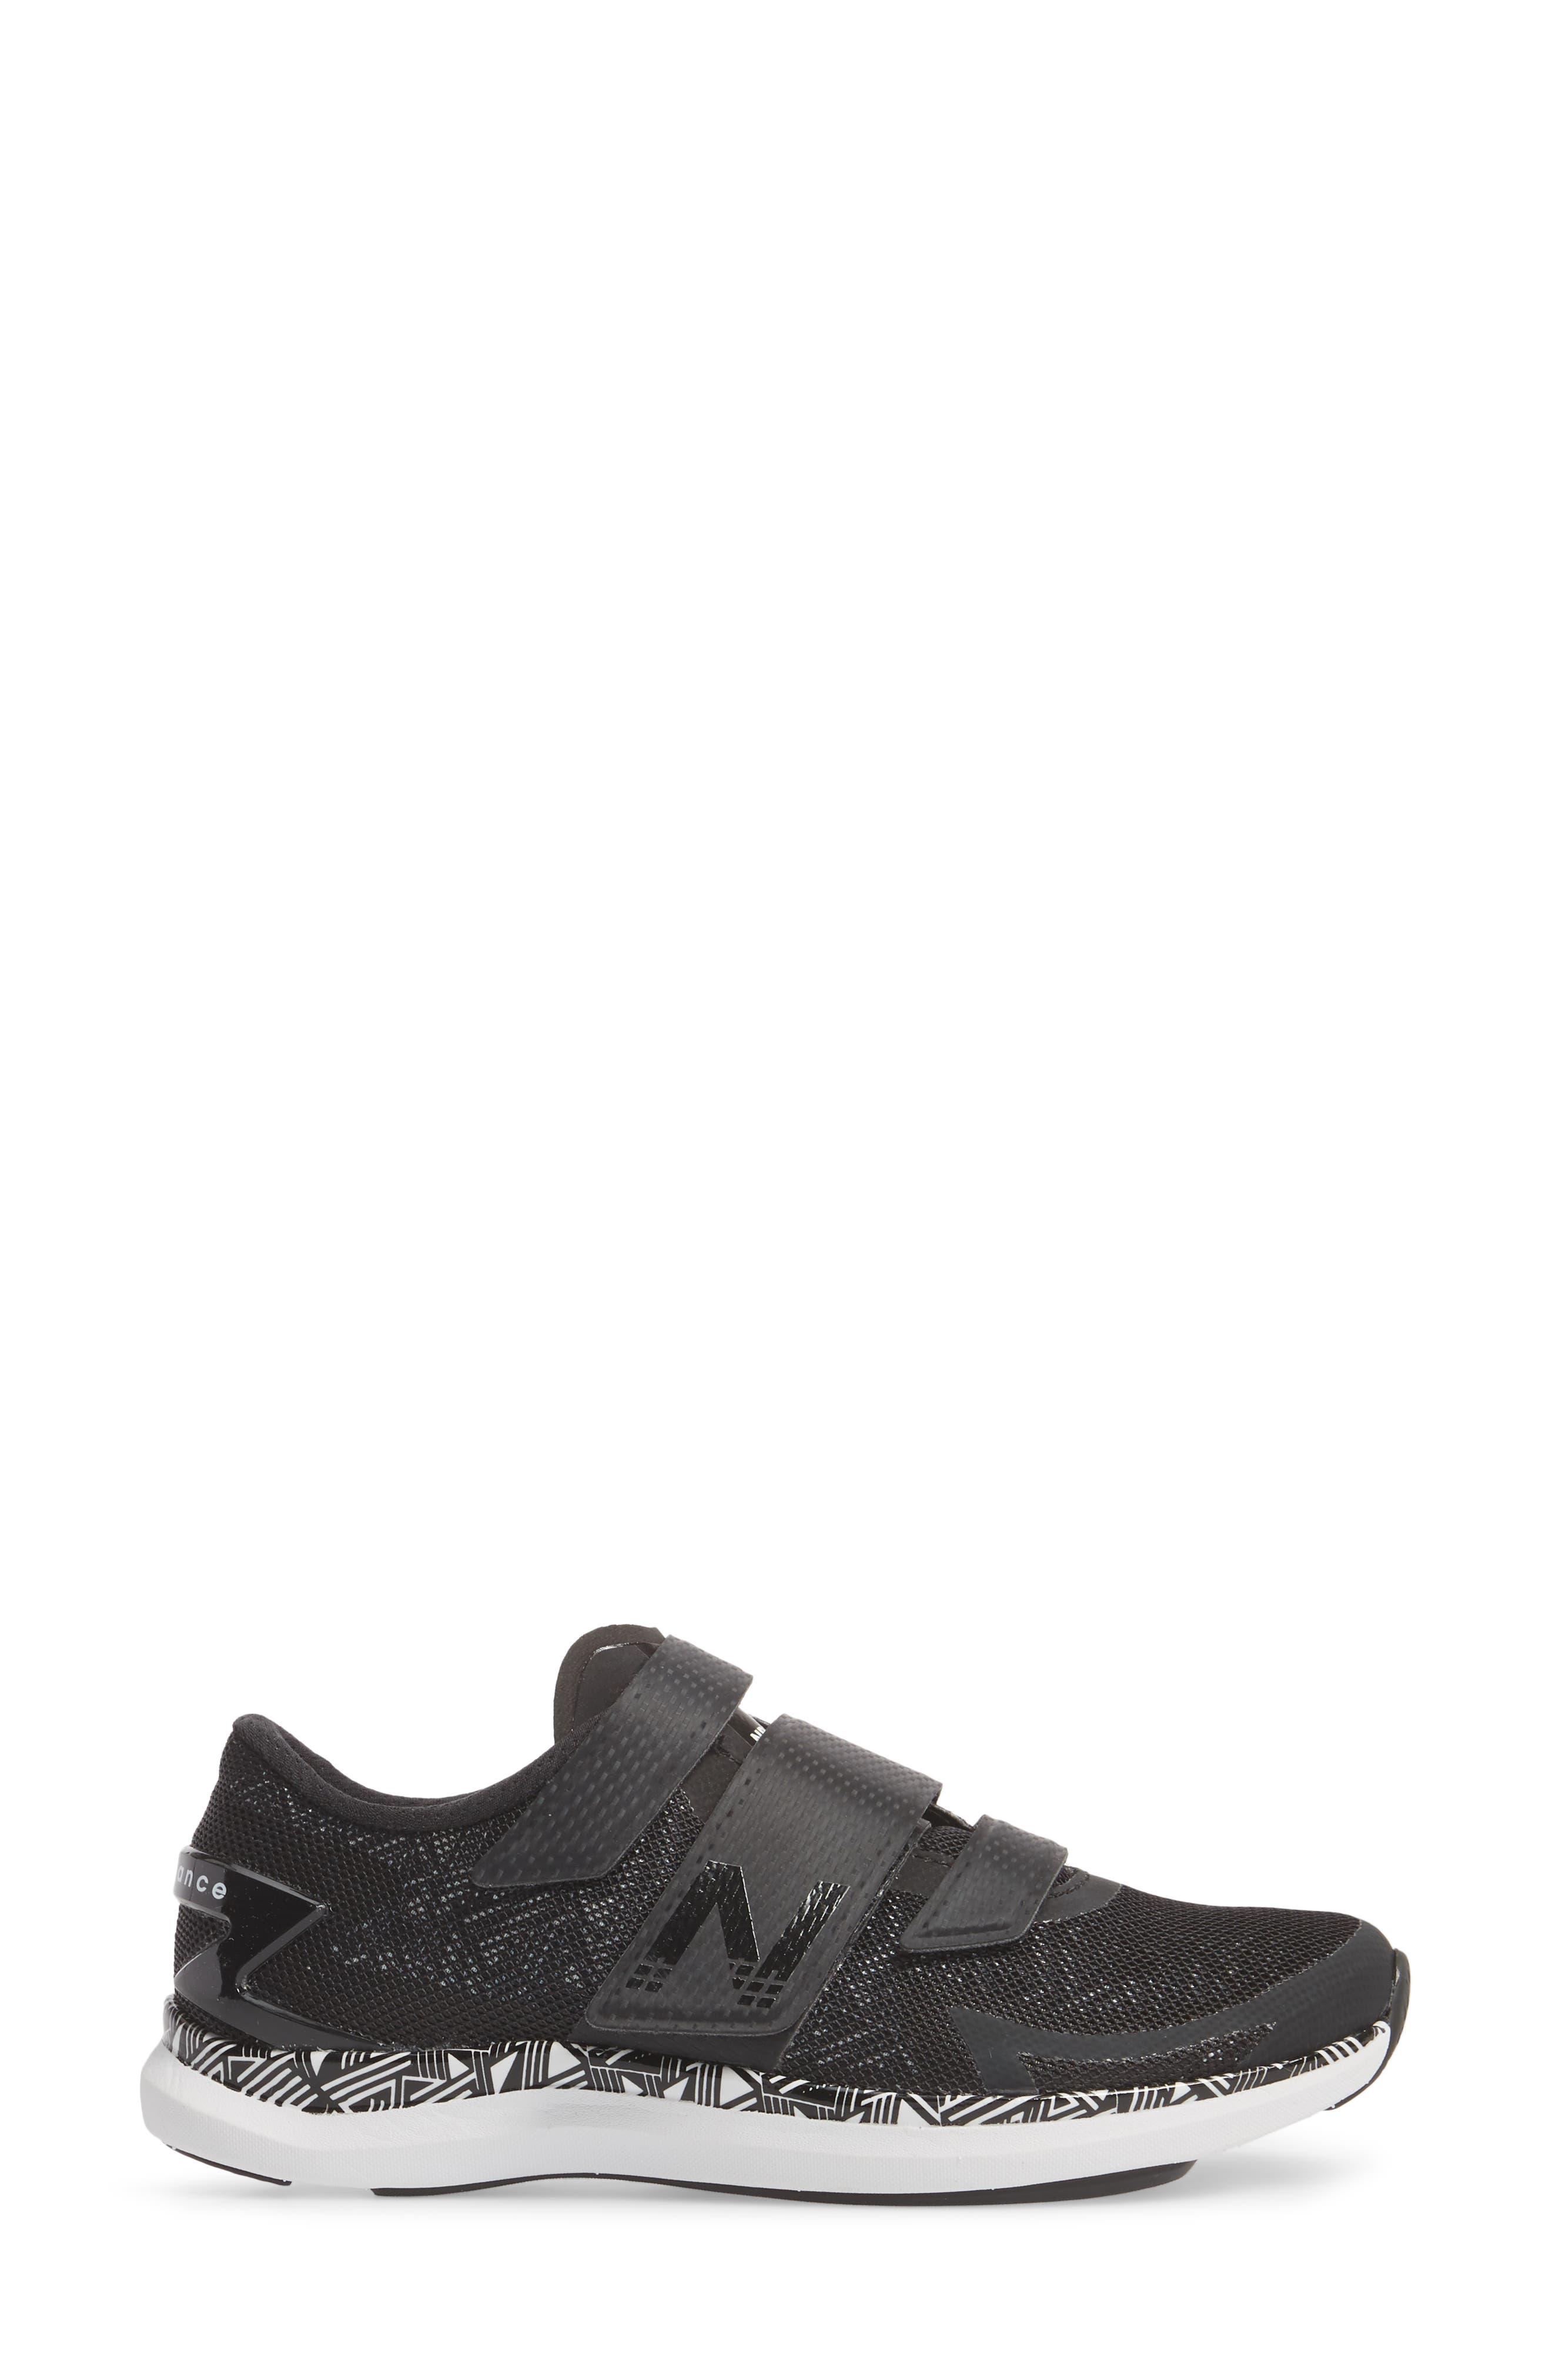 NEW BALANCE, Spin 09 Cycling Shoe, Alternate thumbnail 3, color, BLACK/ WHITE